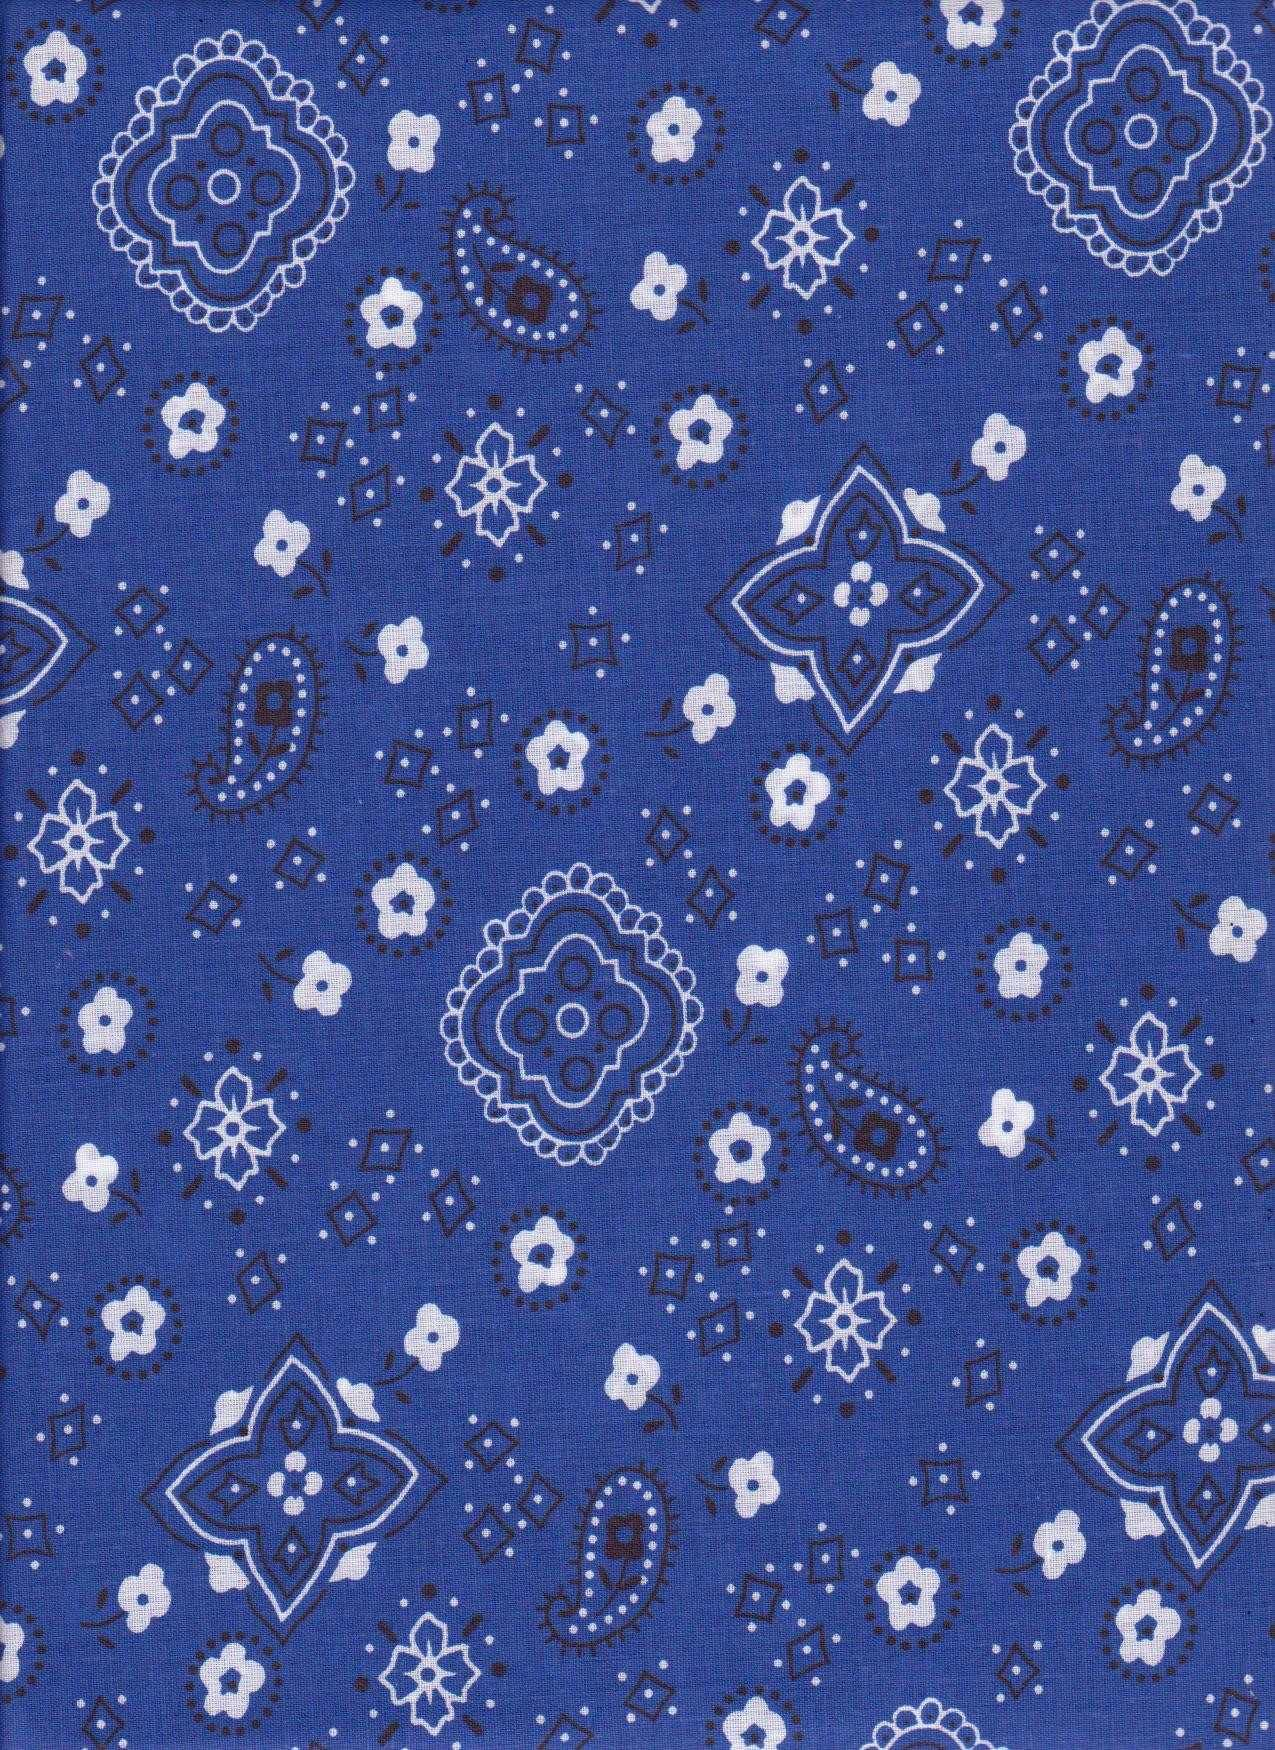 Bandana Wallpapers - Top Free Bandana Backgrounds